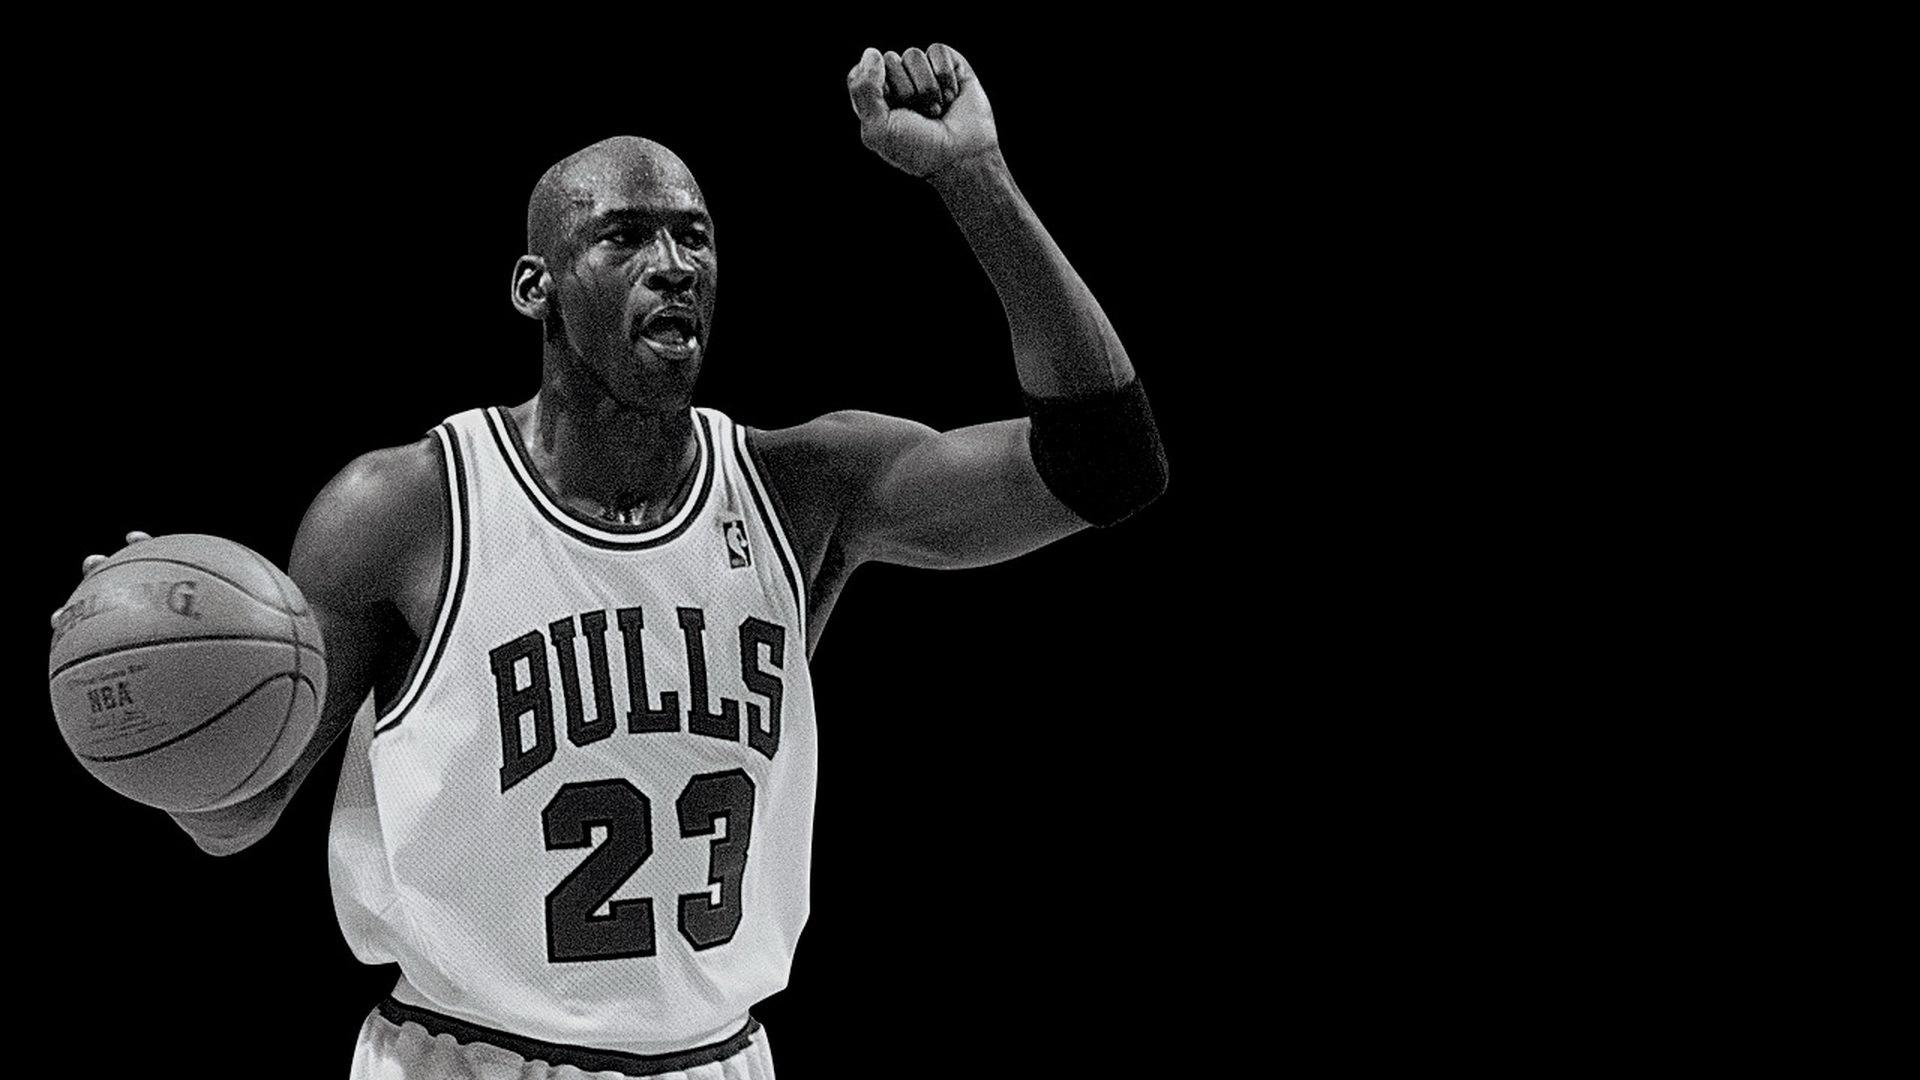 4k Wallpaper Michael Jordan 4k , HD Wallpaper & Backgrounds